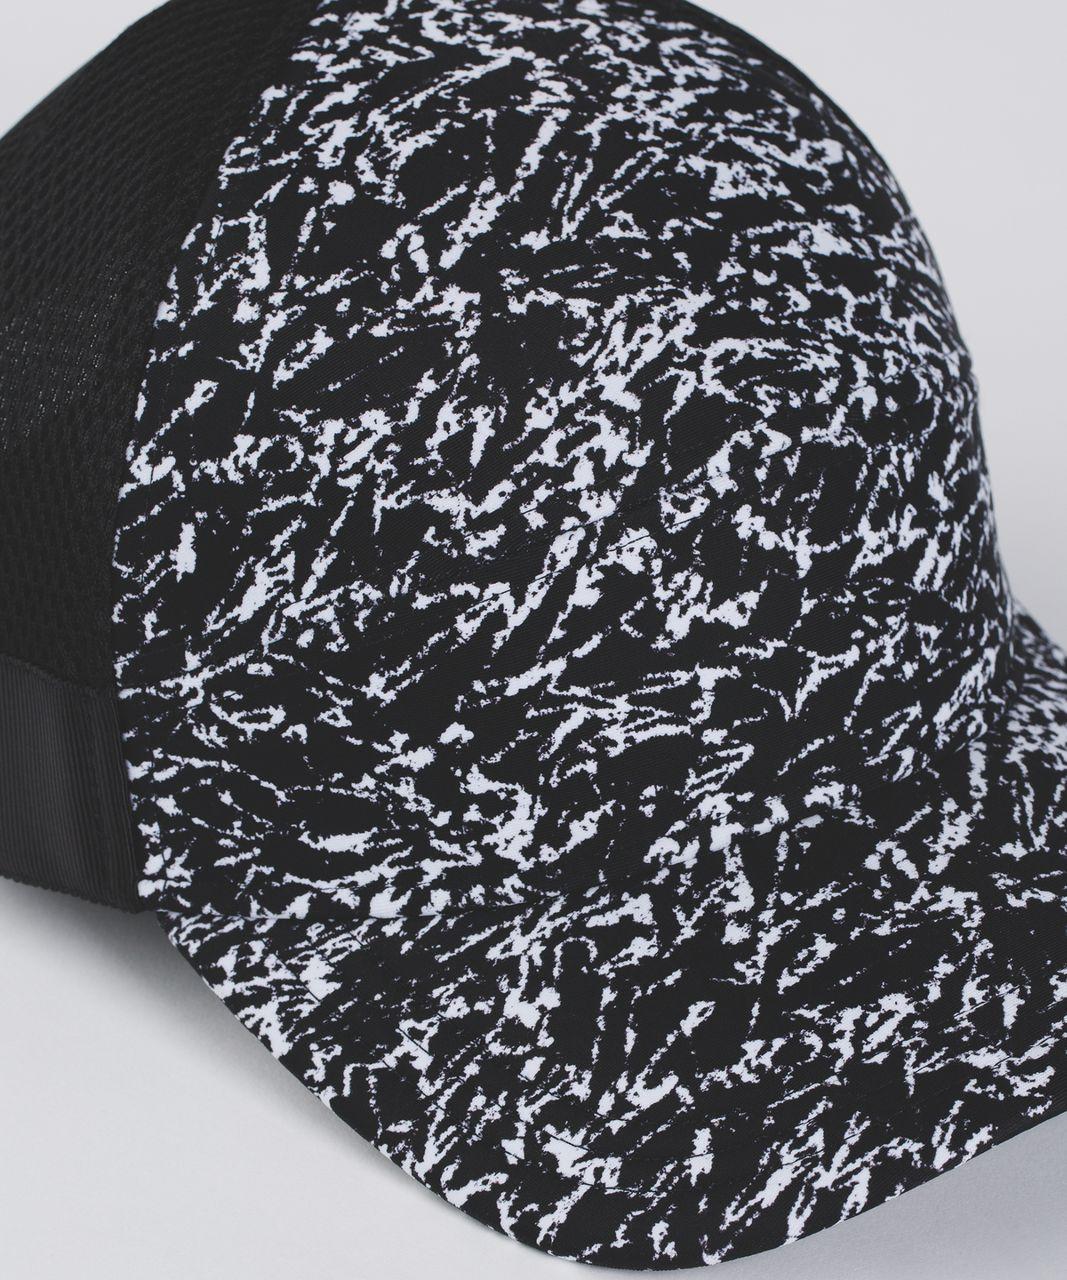 Lululemon Dash And Splash Cap - Iced Wave White Black / Black